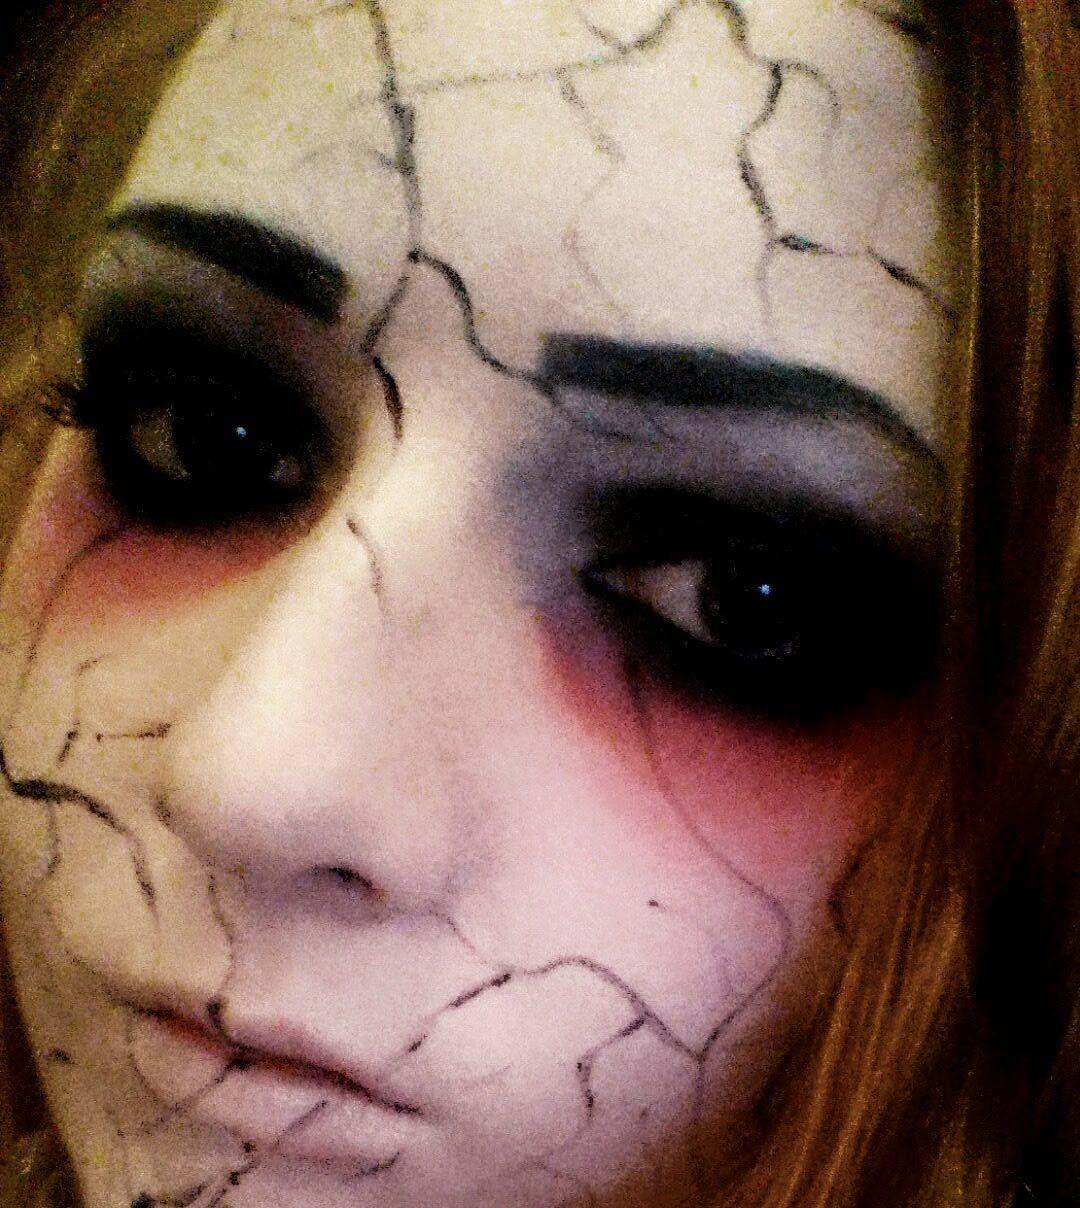 Creepy cracked doll make up tutorial makeup pinterest creepy creepy cracked doll make up tutorial makeup pinterest creepy baditri Image collections